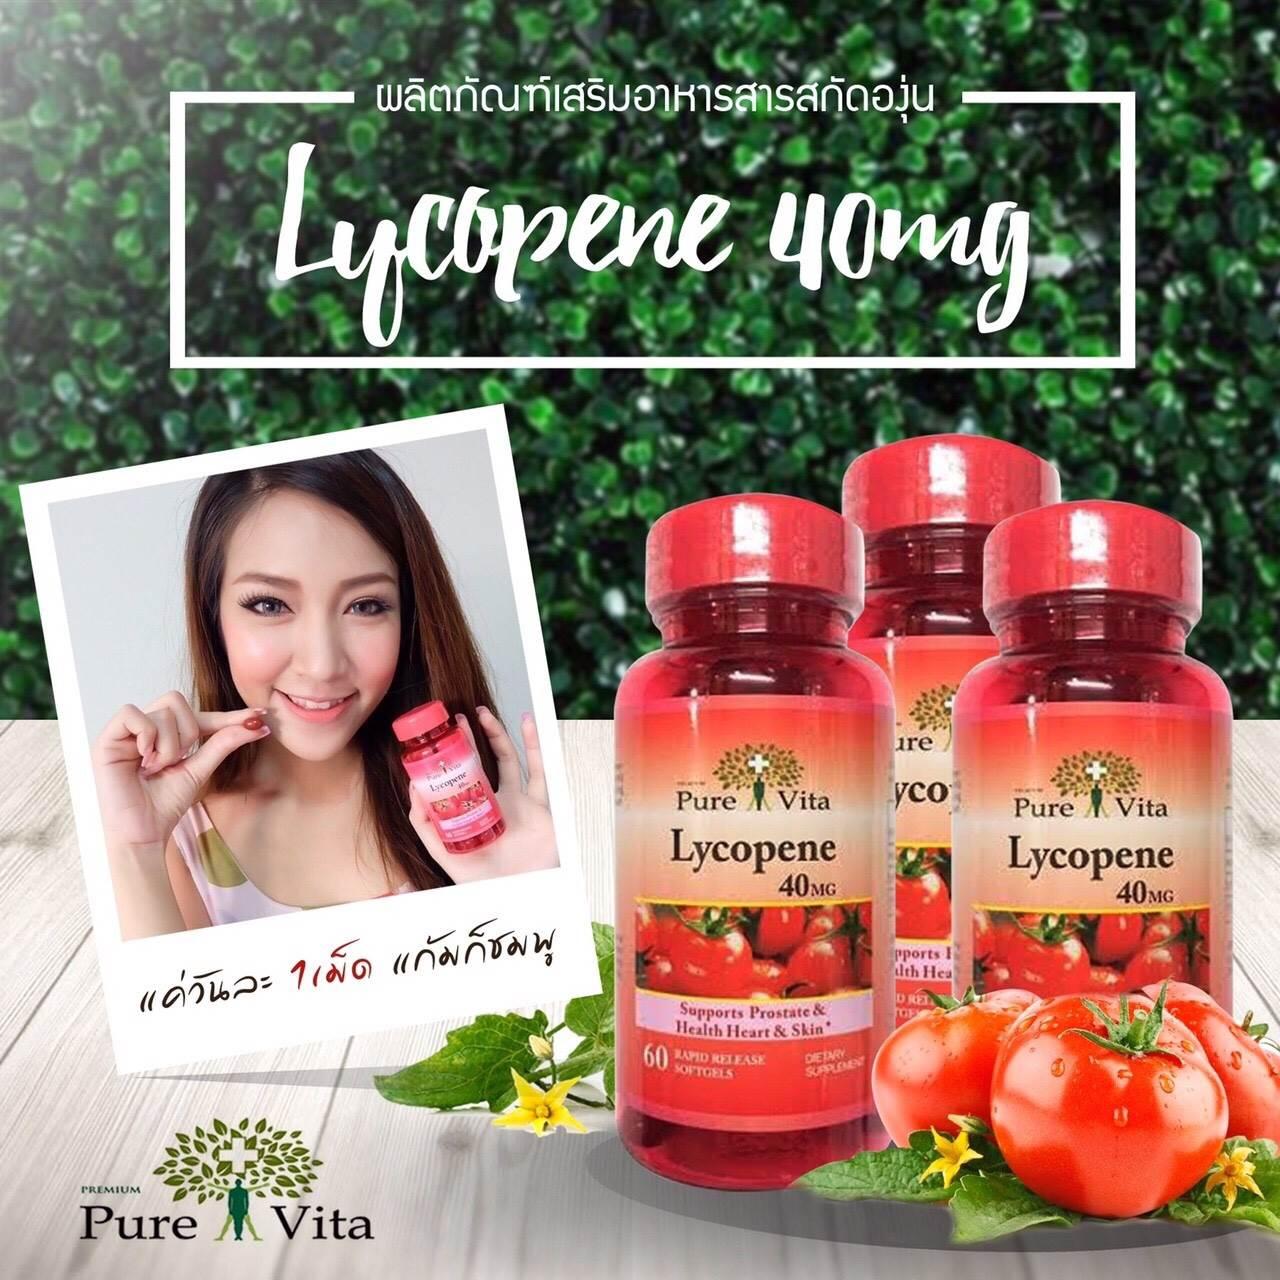 Pure Vita Lycopene 40 mg 60 softgels ไลโคปีน จากมะเขือเทศ จาก แคนนาดา